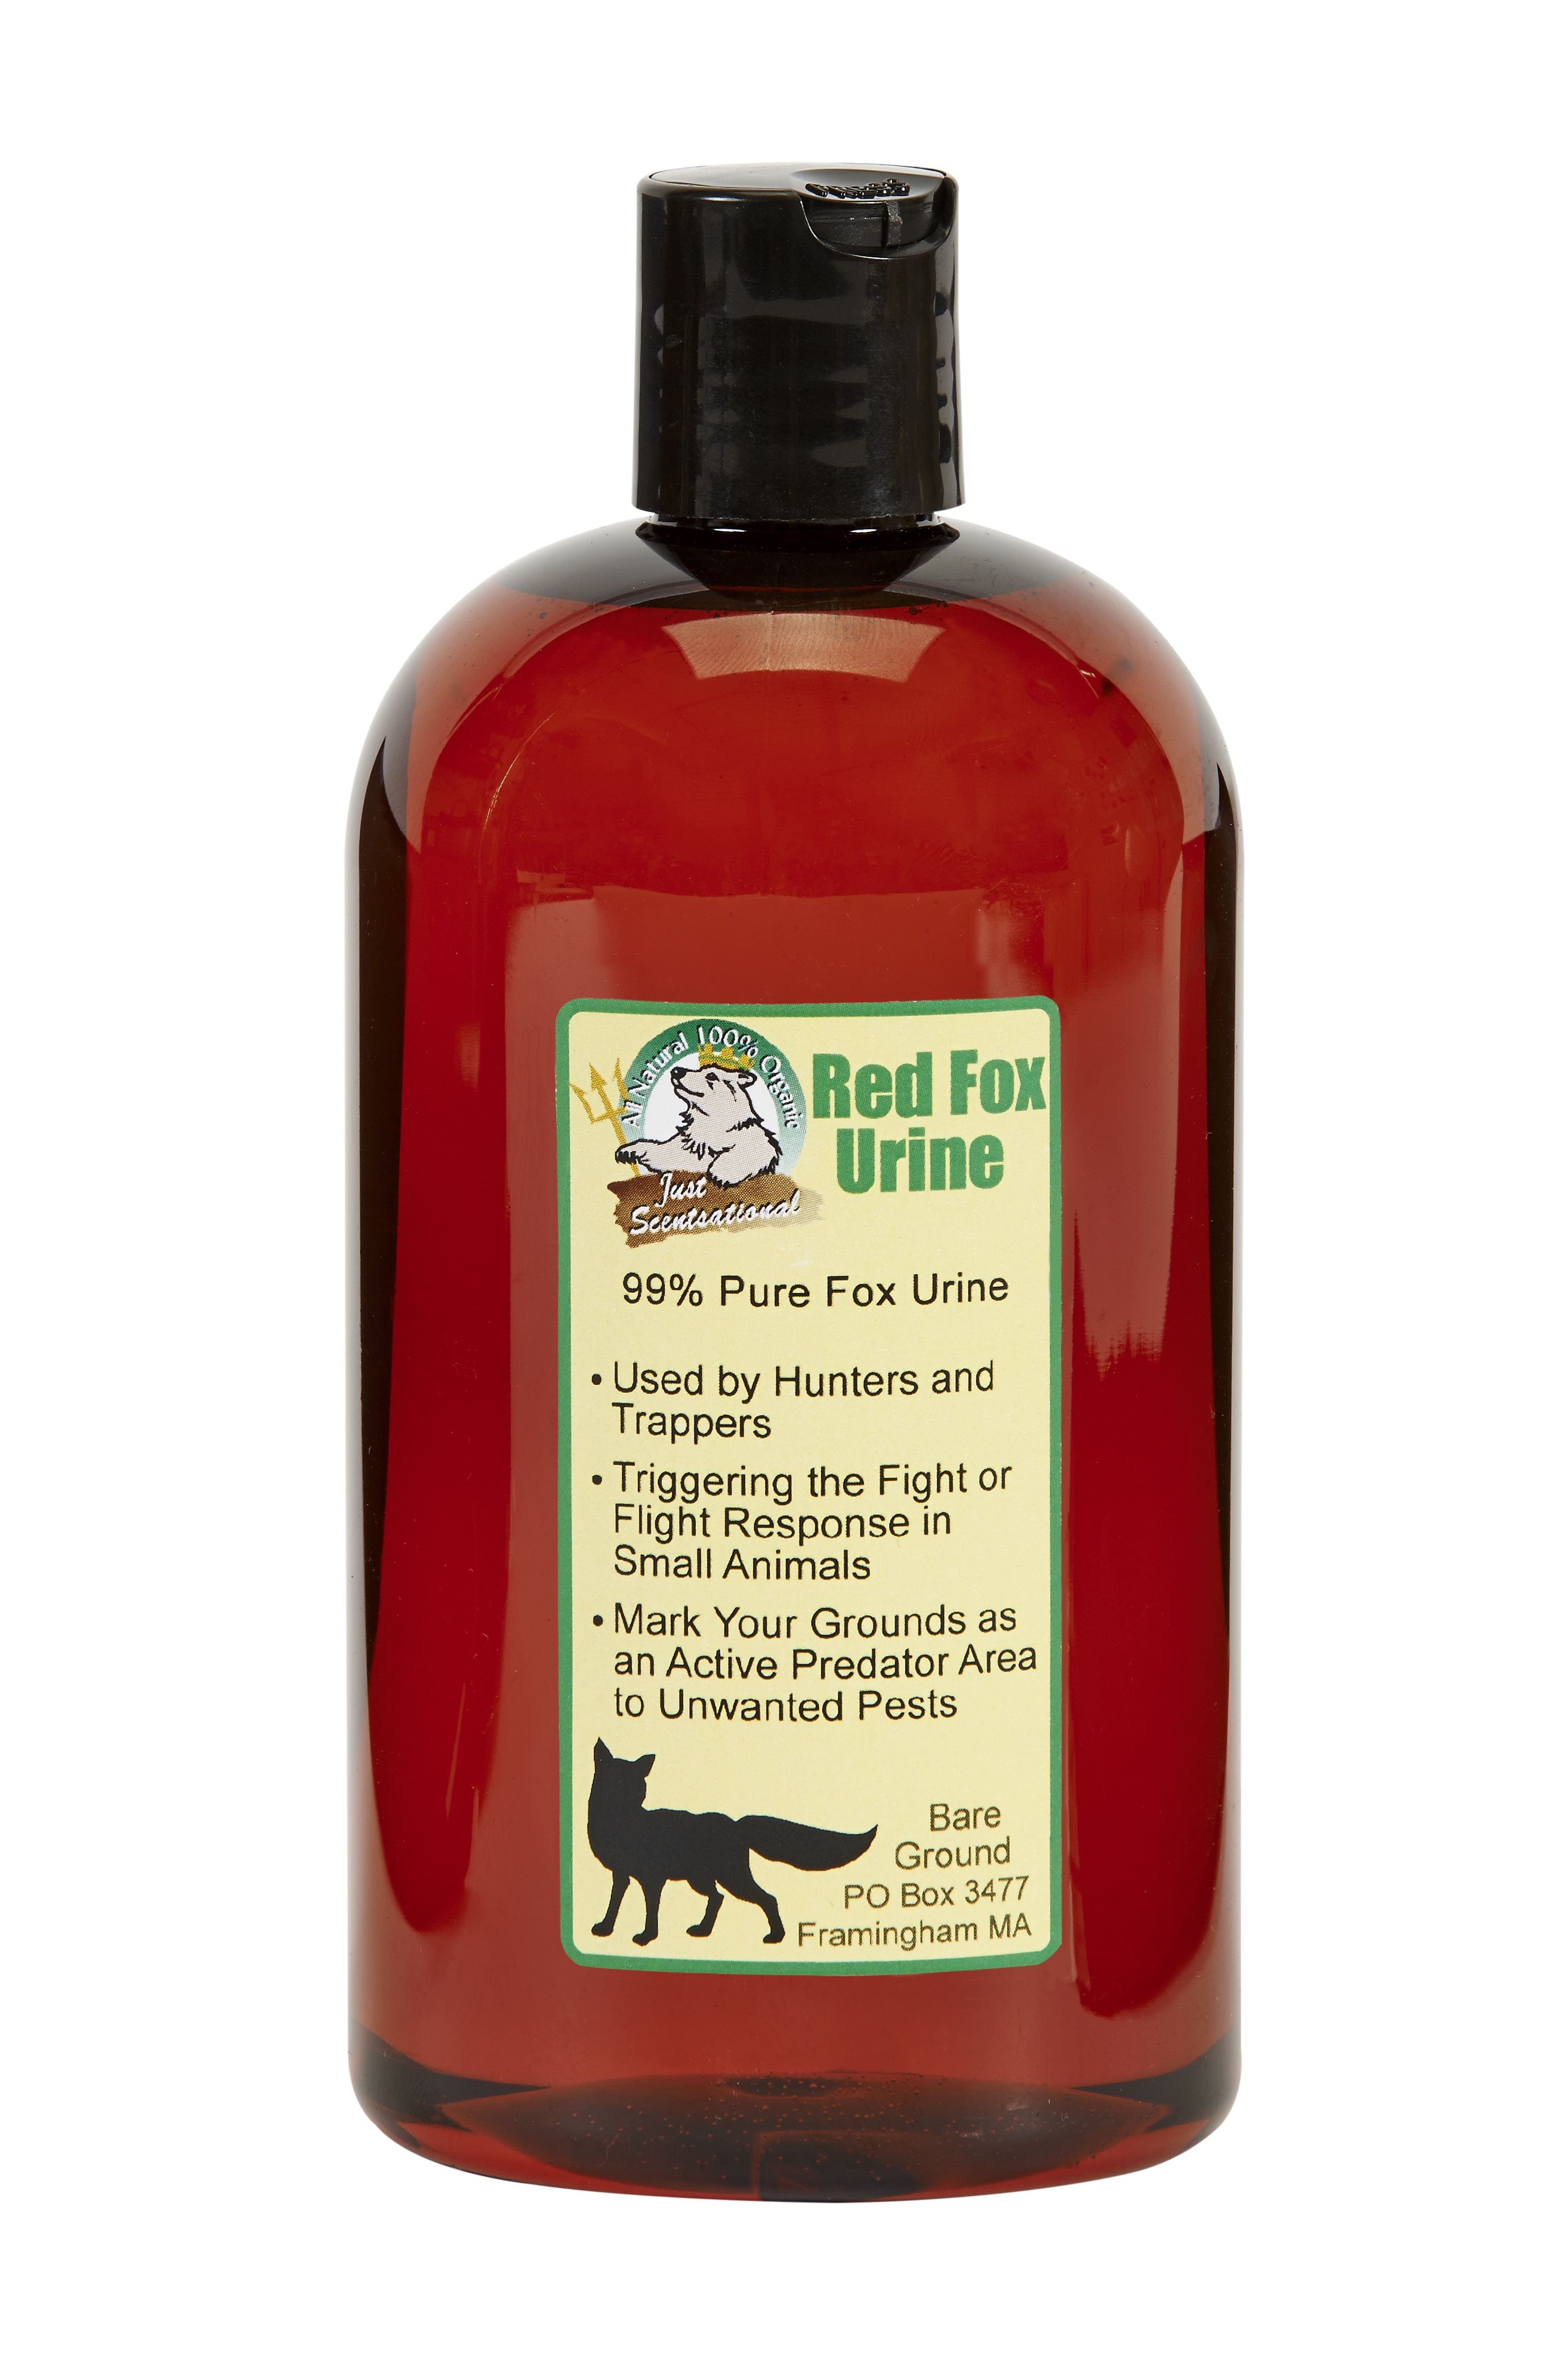 Just Scentsational Fox Urine Predator Scent 16 oz Bottle